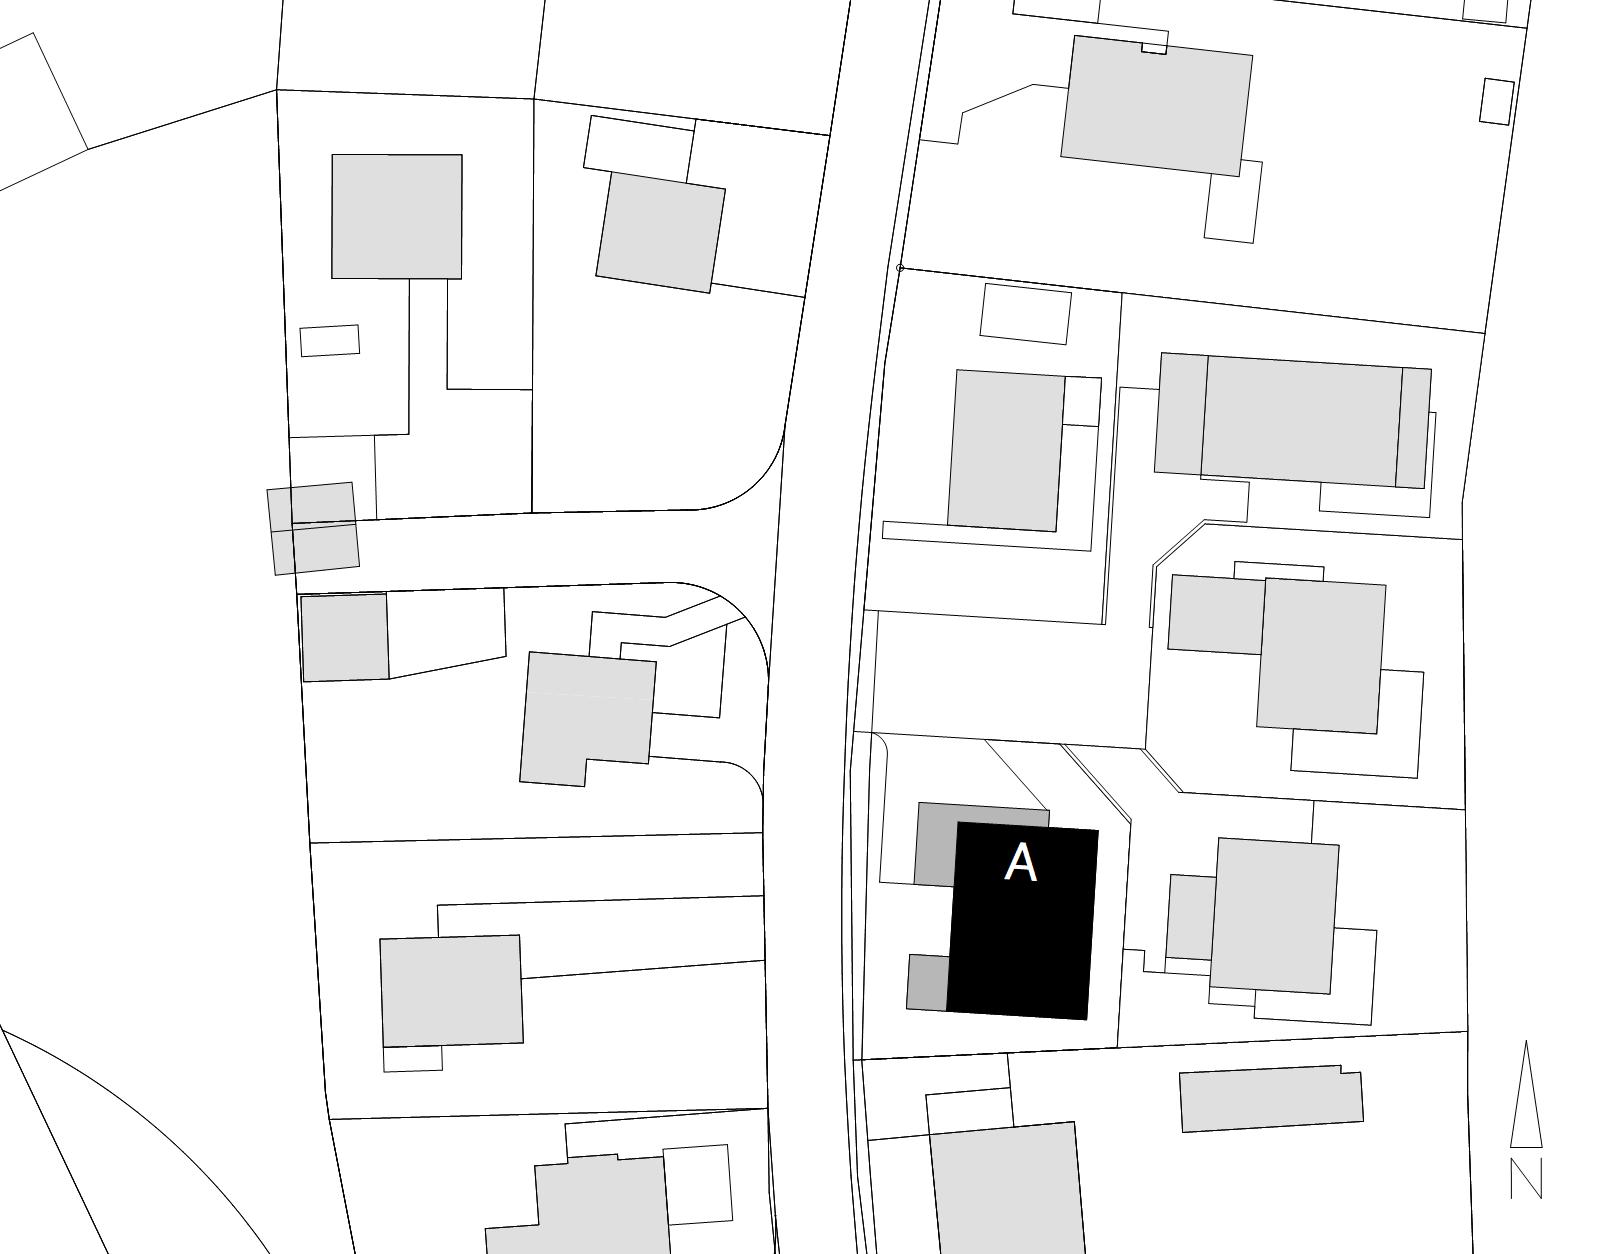 Neubau EFH Haus A Lerchenfeld Gerlafingen